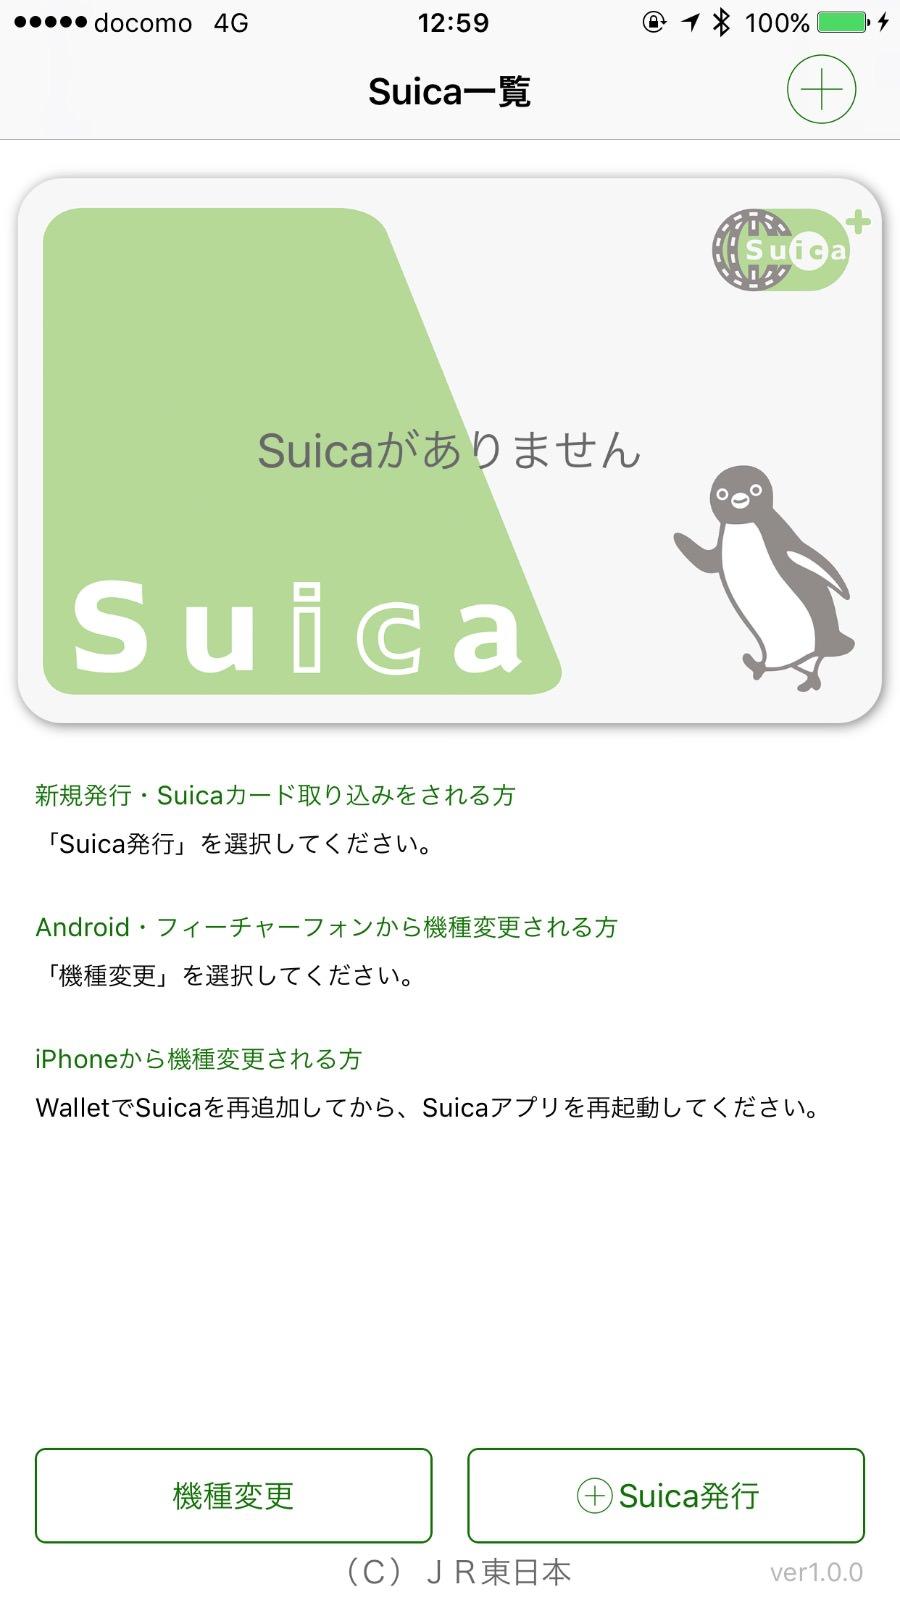 Mobile suica 0223